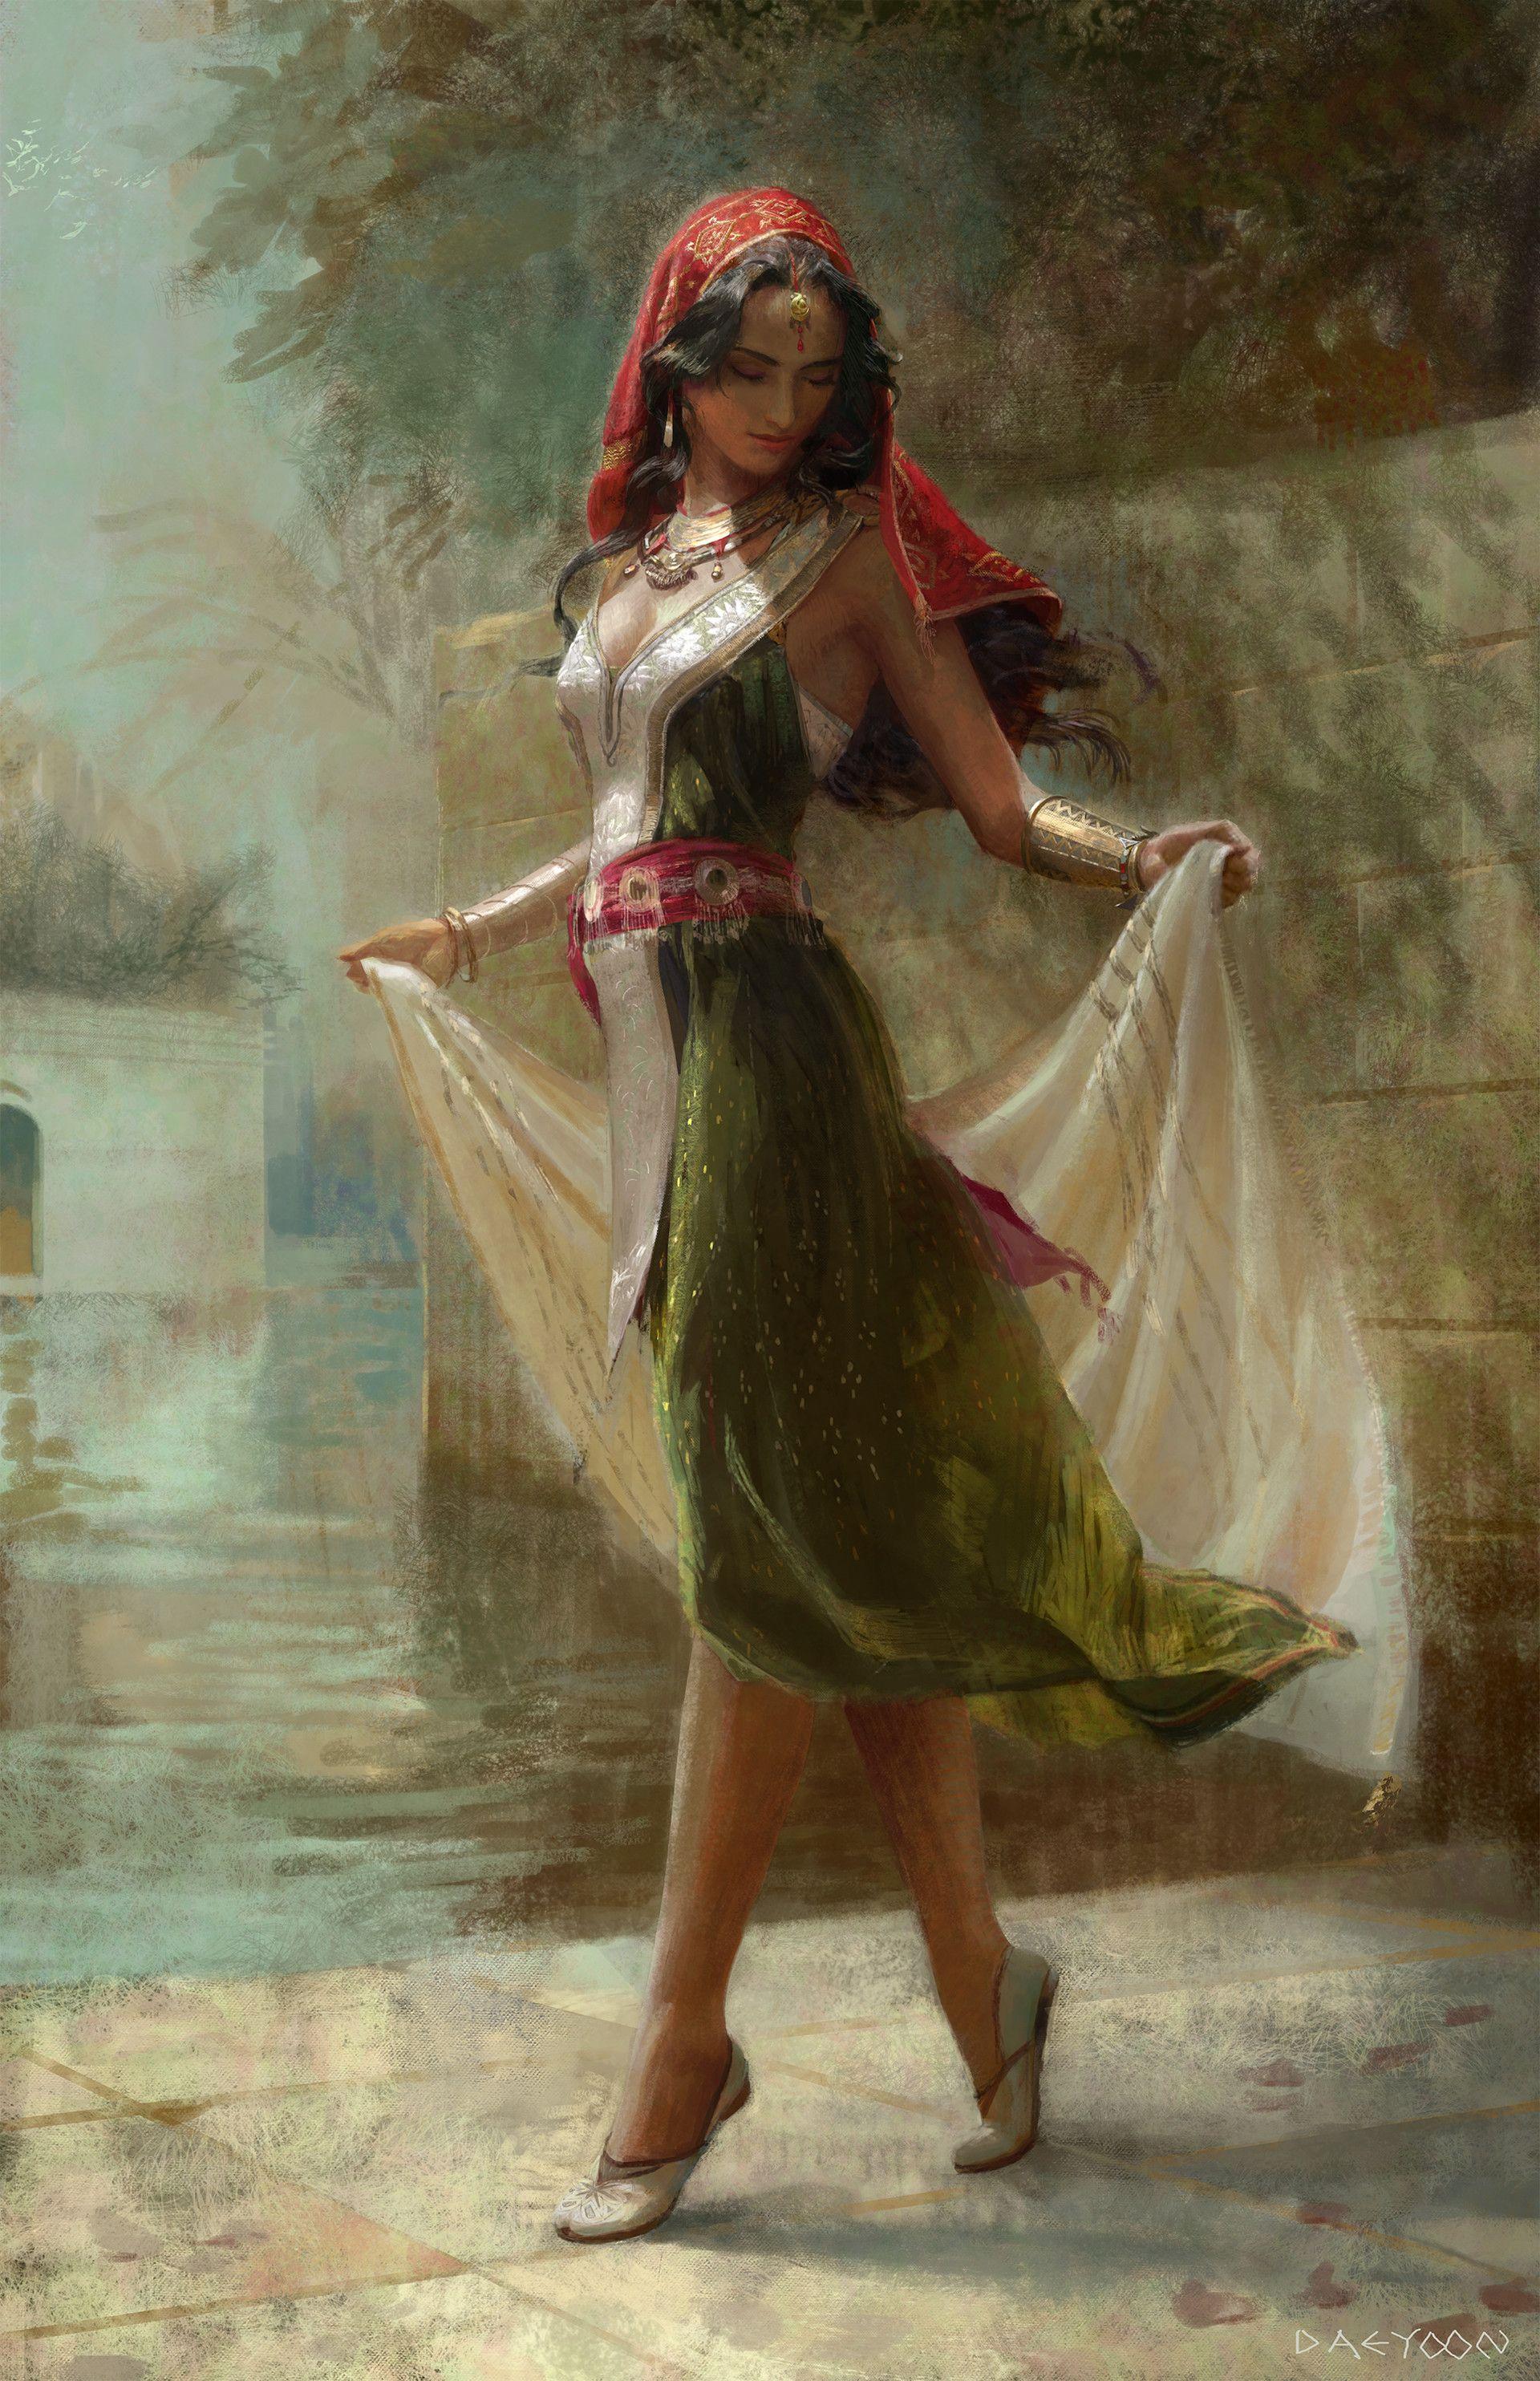 Artstation Fatima From The Alchemist Daeyoon Huh With Images Malarstwo Olejne Malarstwo Obrazy